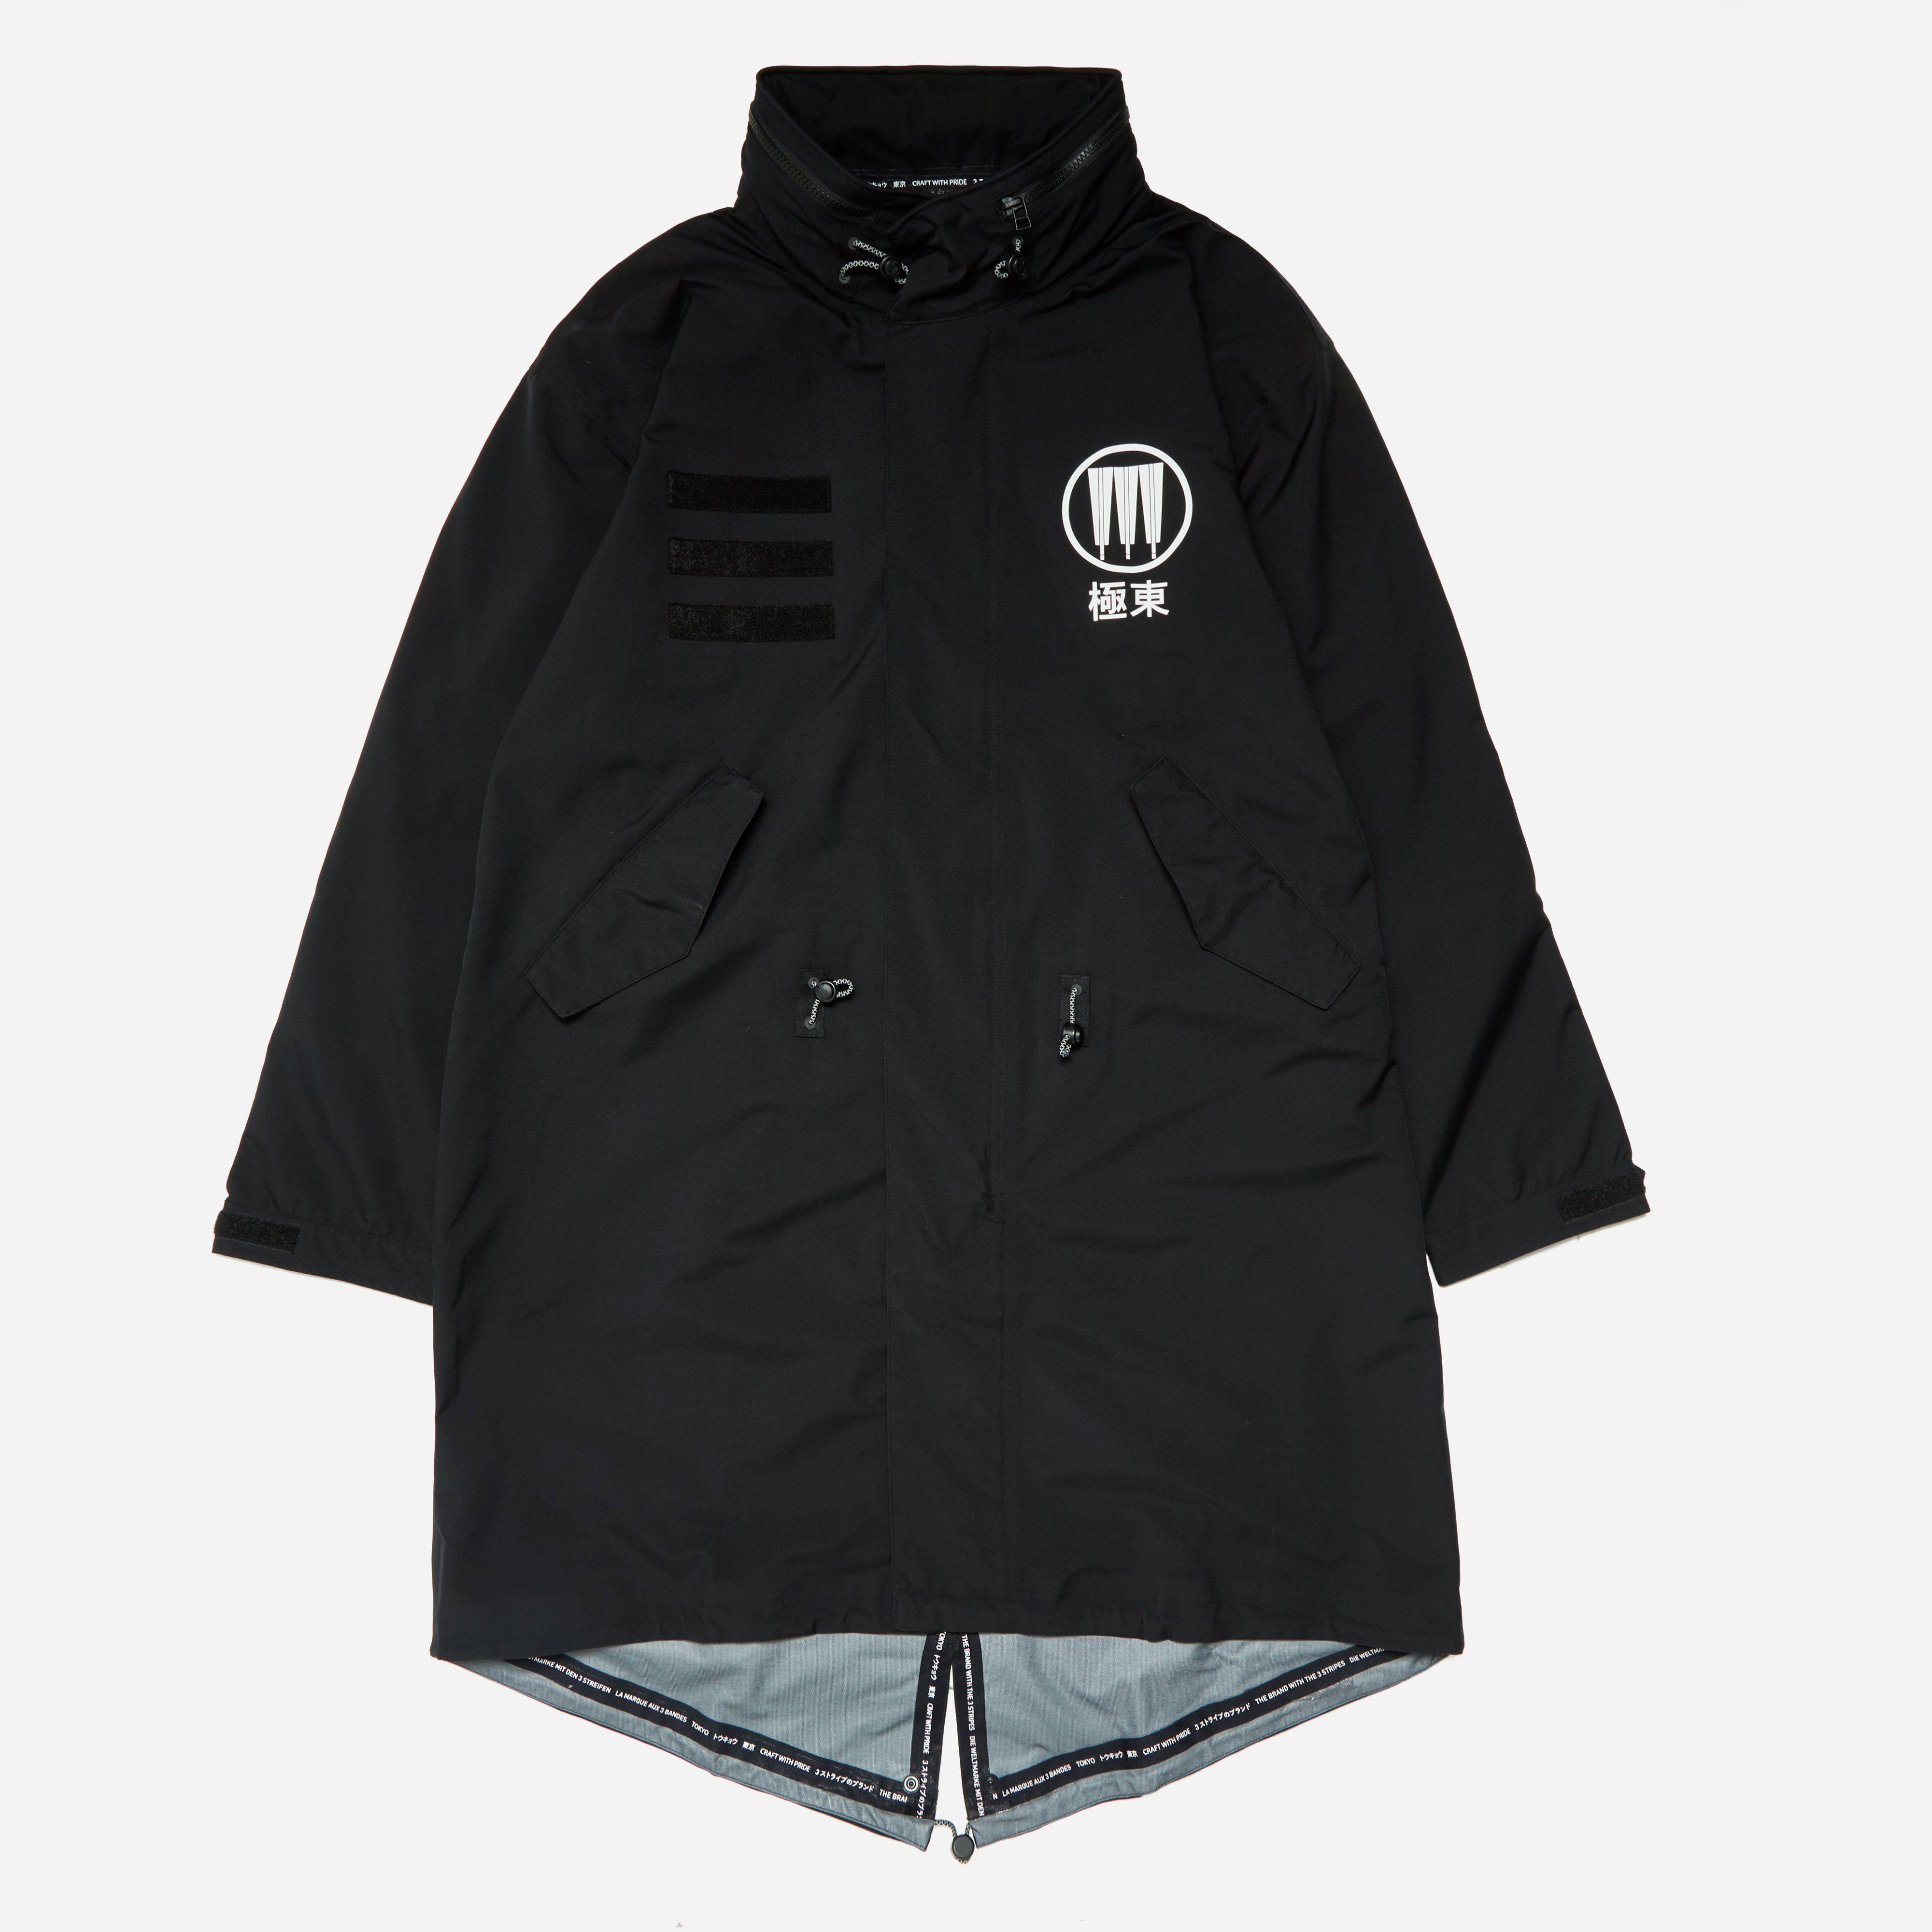 Adidas Originals x barrio m 51 chaqueta la cadera Store